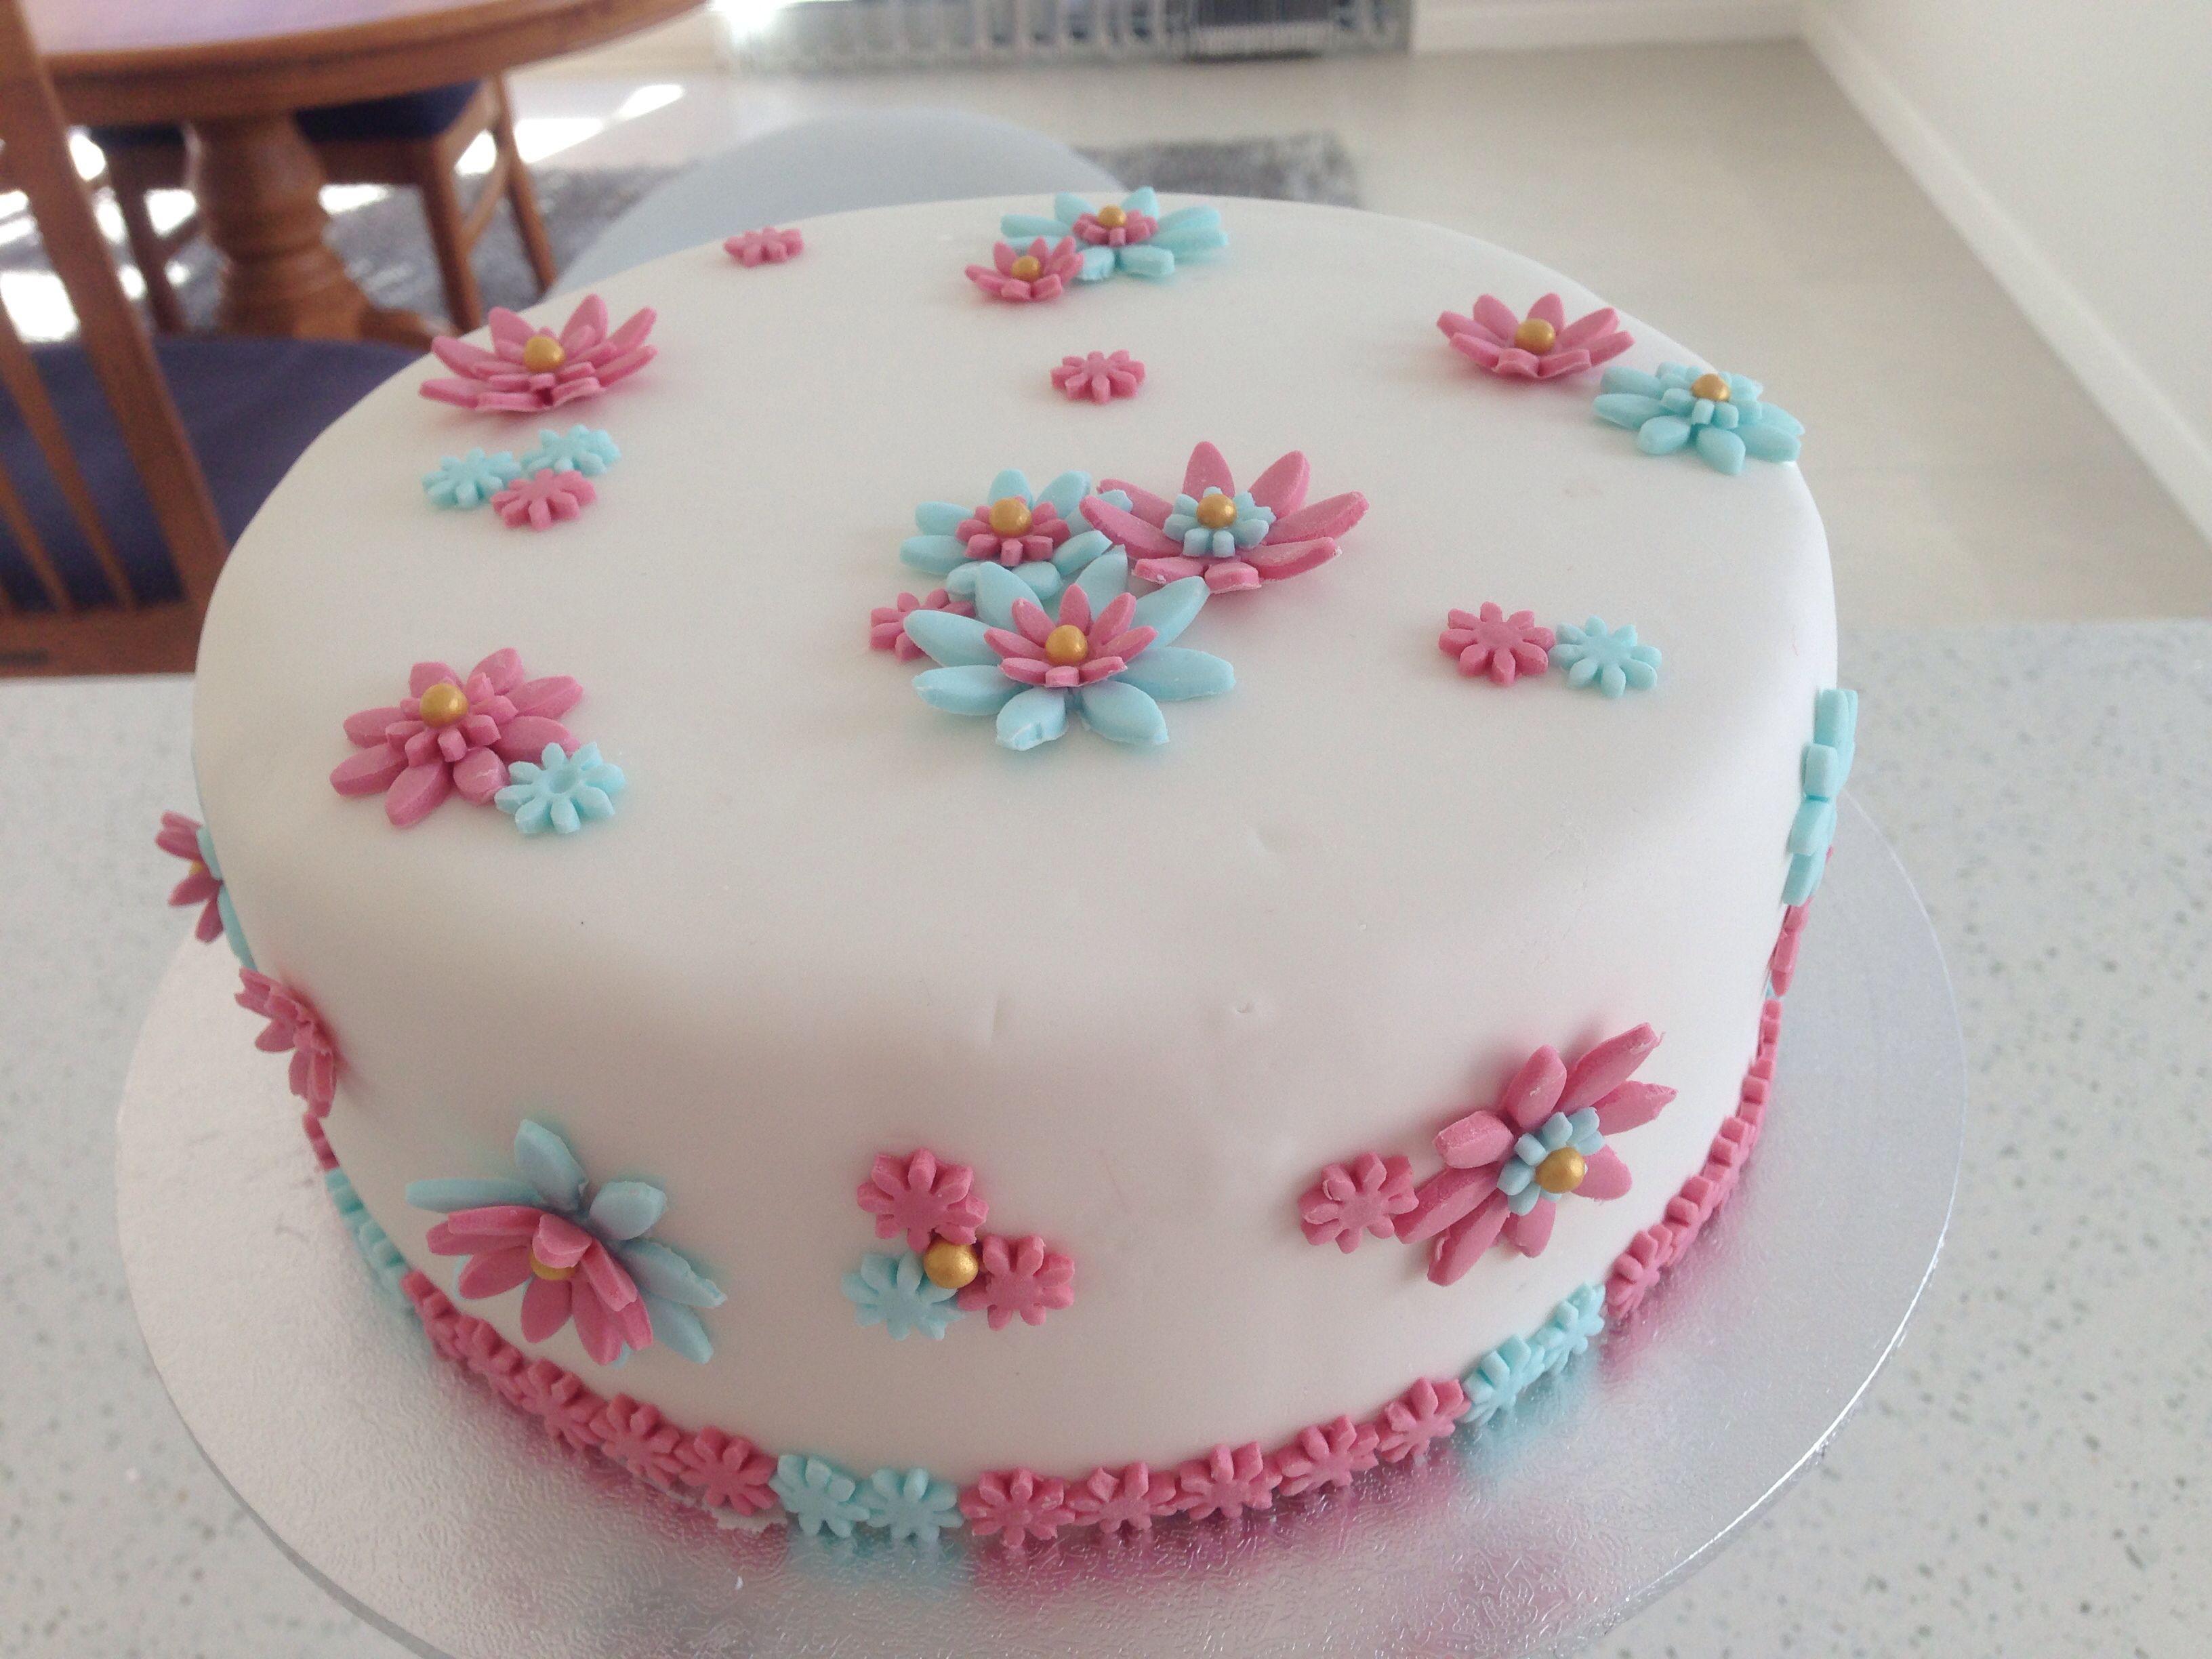 My first fondant cake.